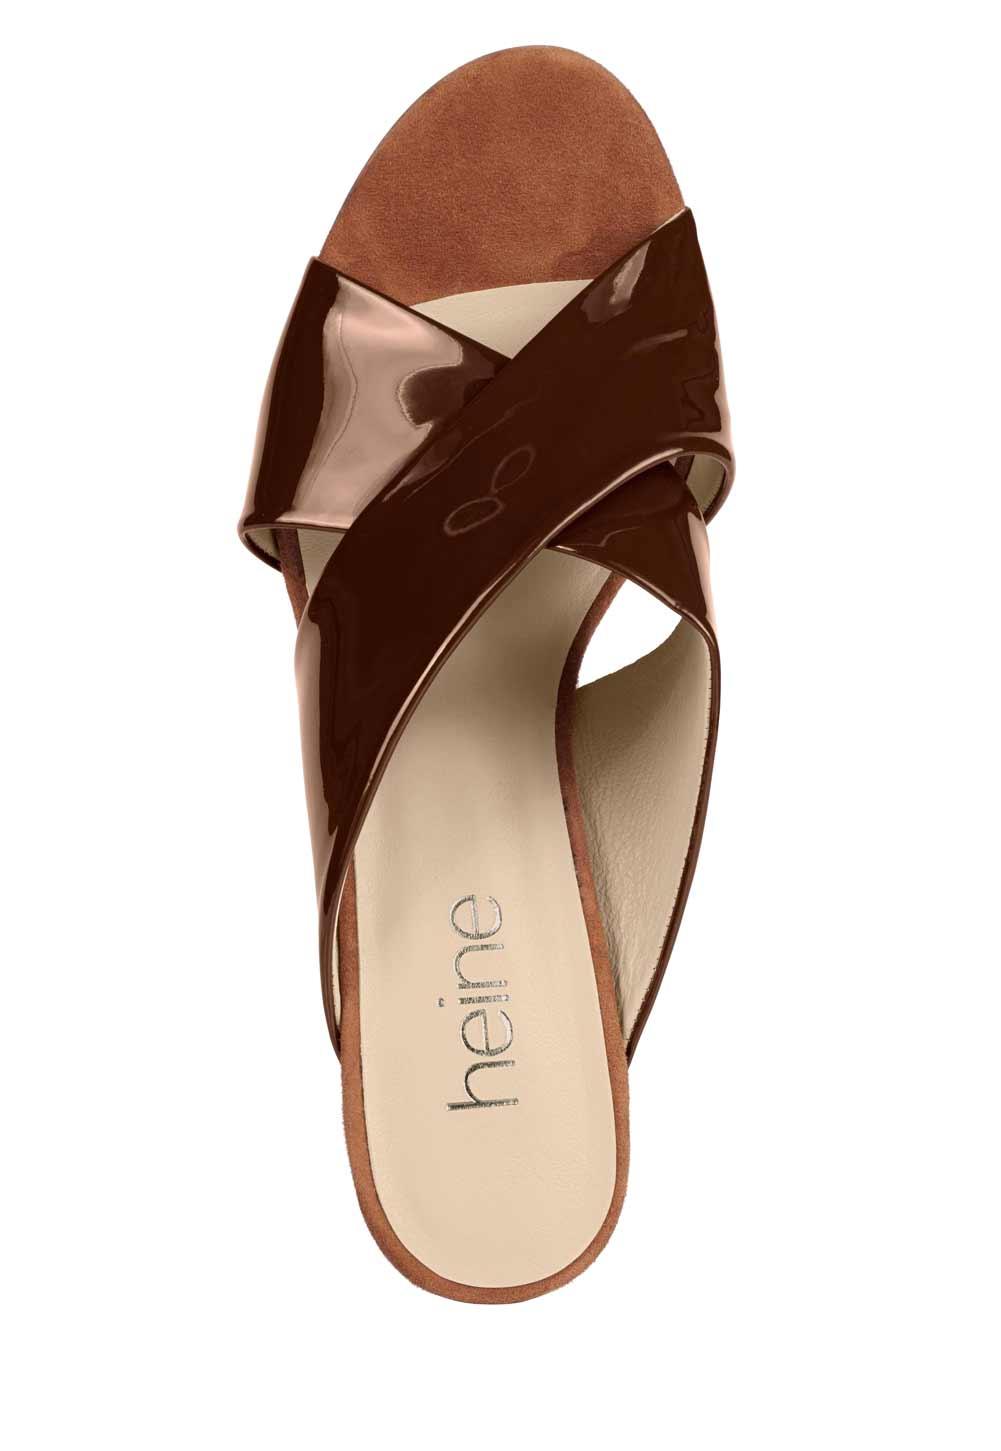 321.530a HEINE Damen Designer-Lackleder-Pantolette Braun